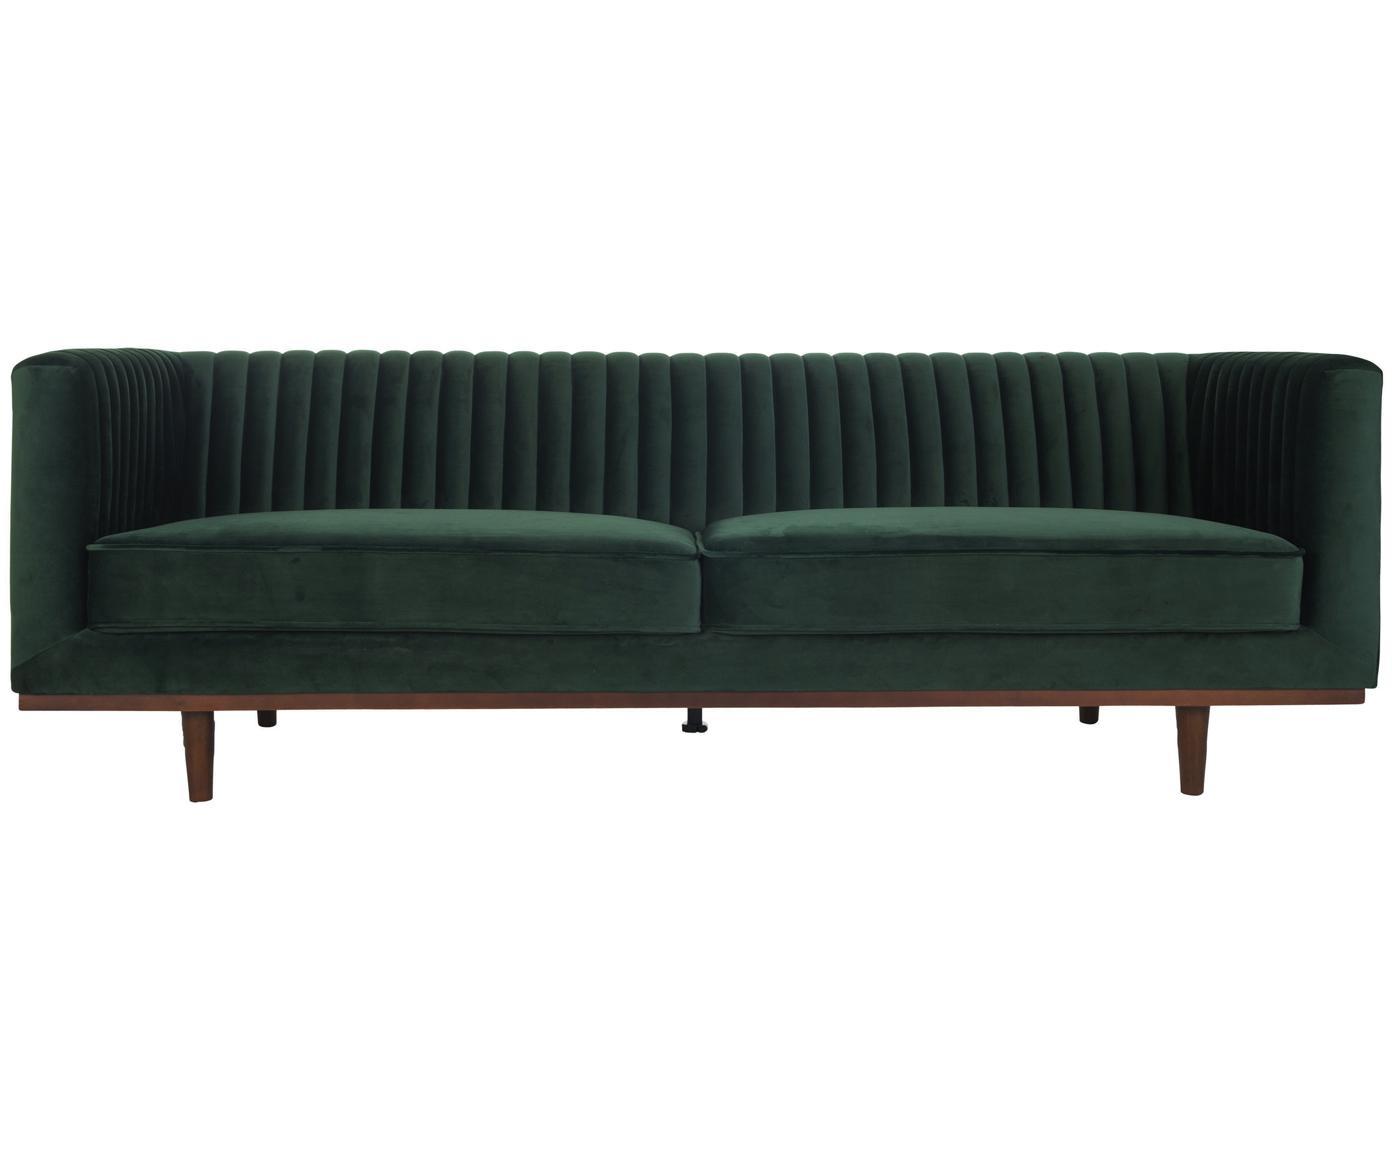 Fluwelen bank Dante (3-zits), Bekleding: polyesterfluweel, Frame: gelakt rubberhout, Groen, B 210 x D 87 cm